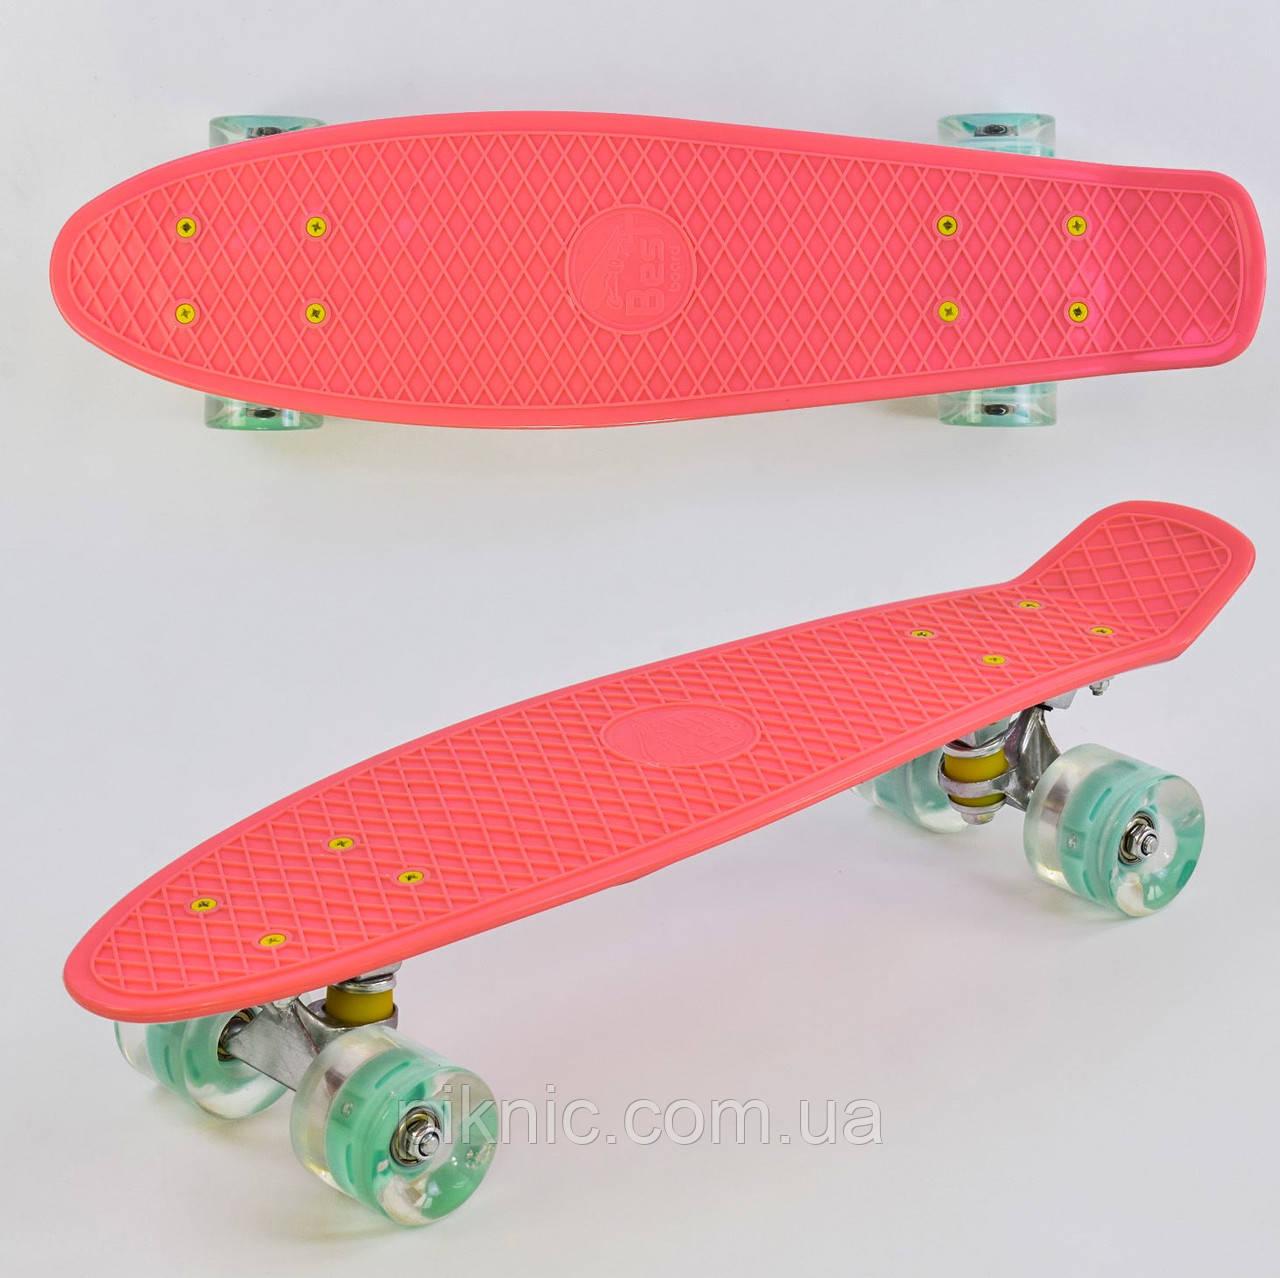 Пенни борд 55 см, СВЕТ колёса PU 6см Розовый 1 Скейтборд, скейт, Penny board, лонгборд для девочки, девушки